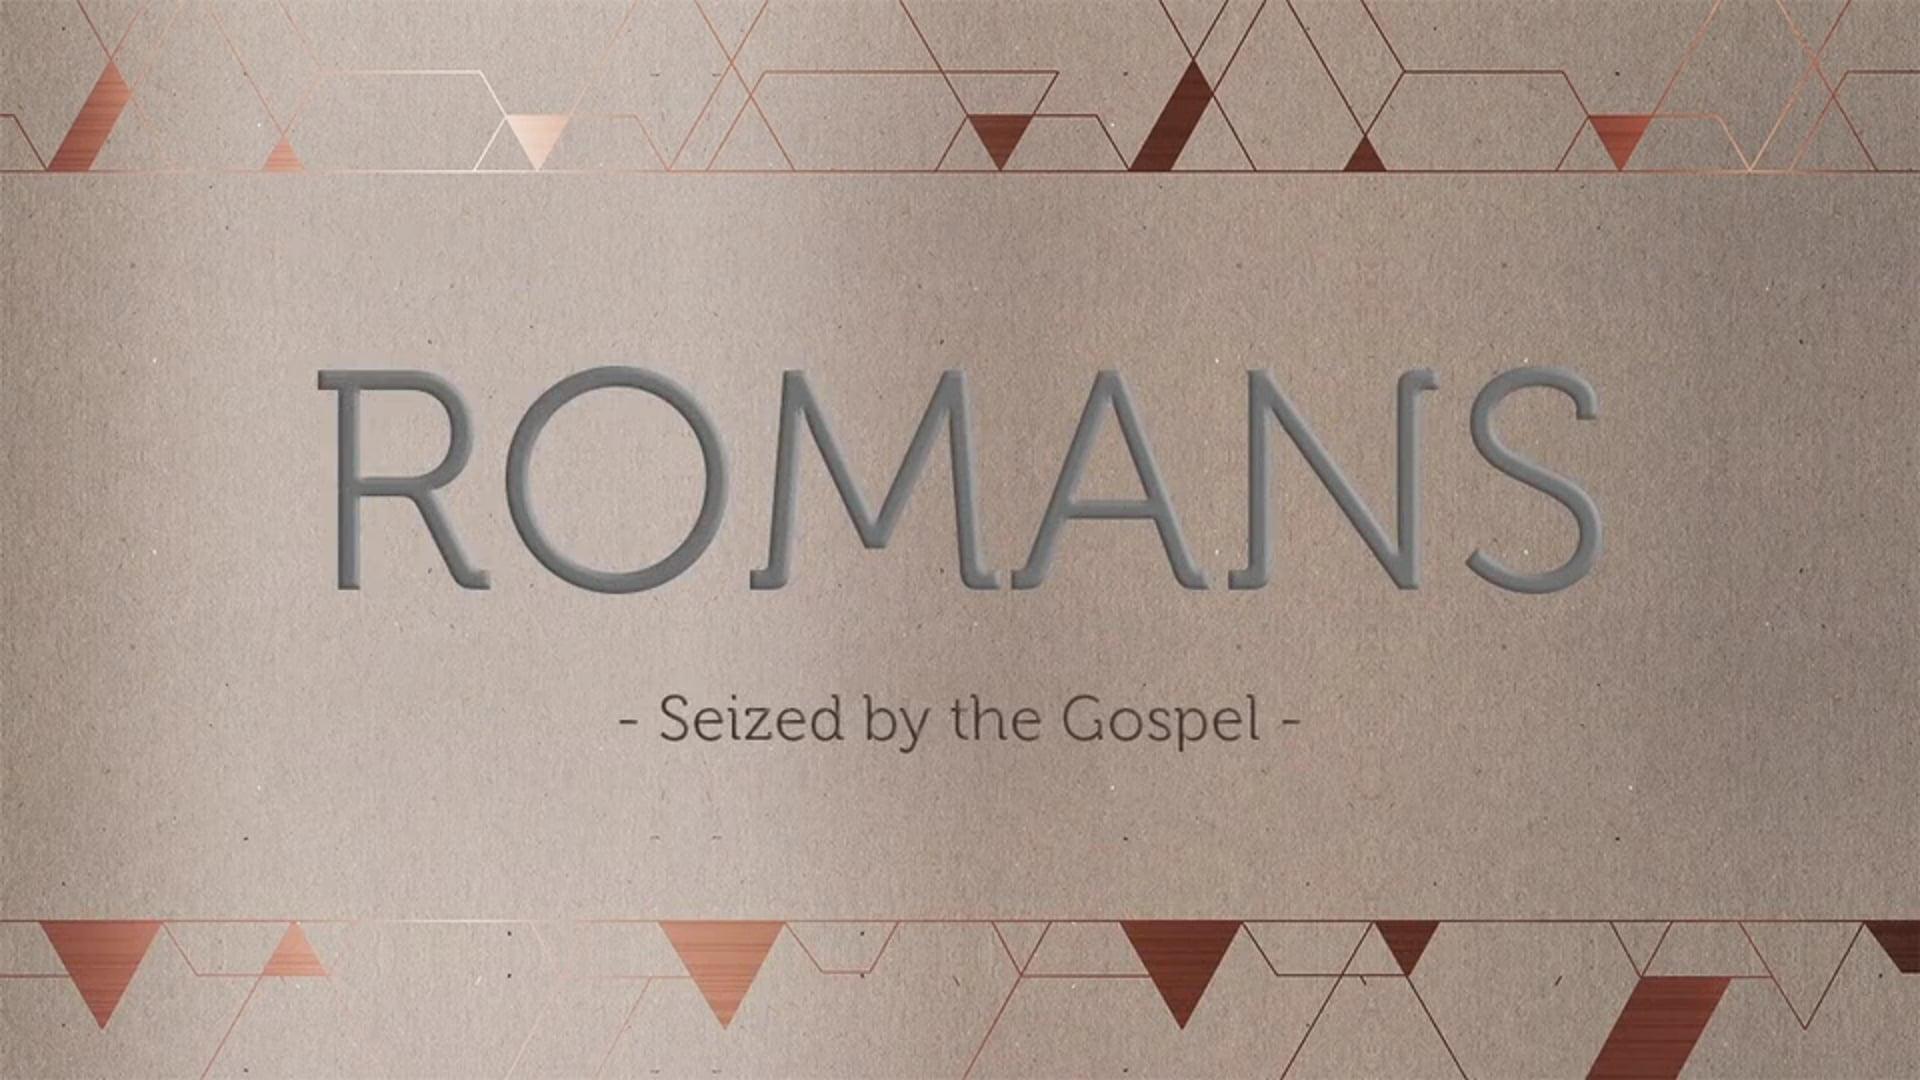 Week 2- The Power of God: Romans 1:8-17